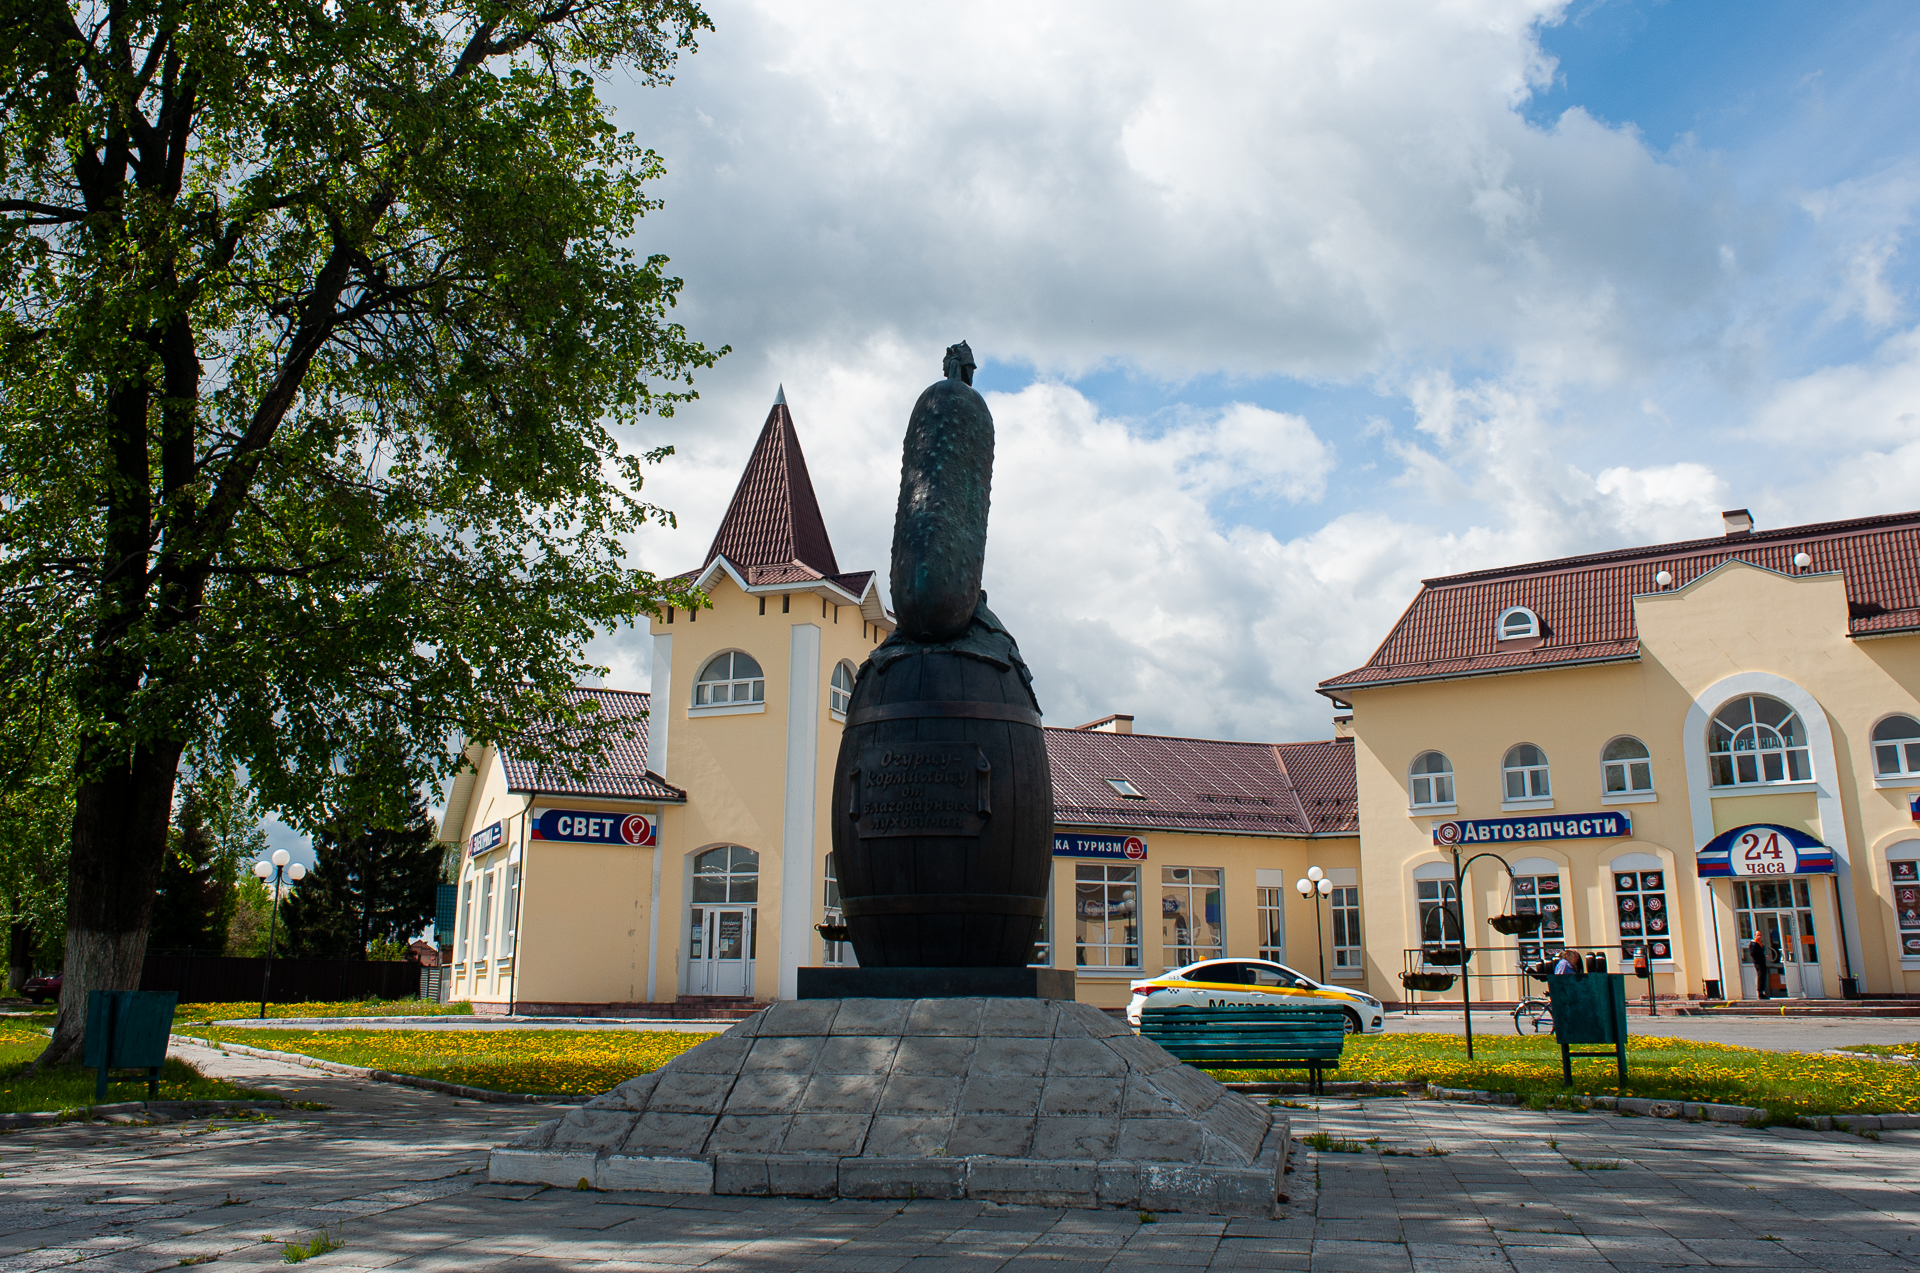 Луховицы, Памятник луховицкому огурцу